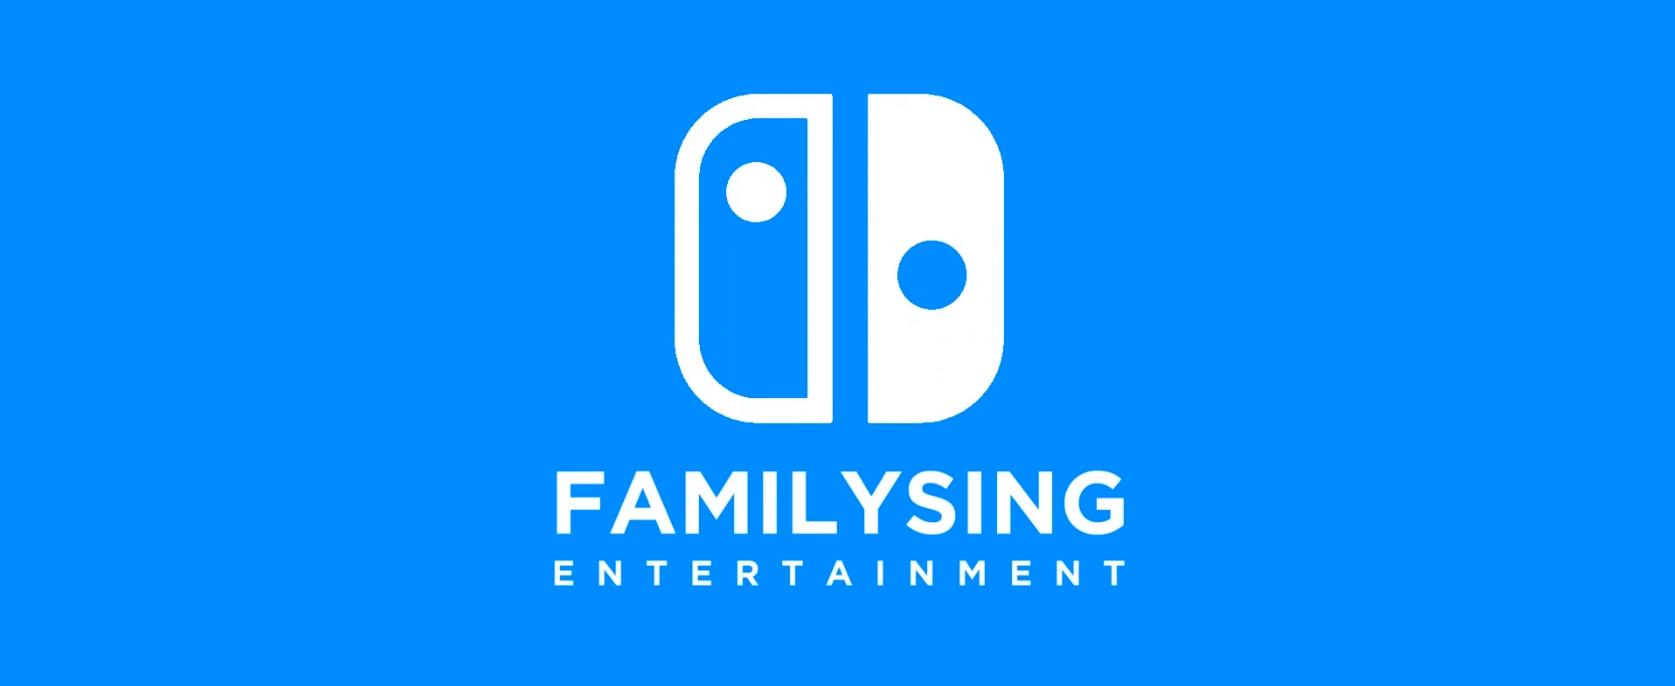 Familysing 2018 logo